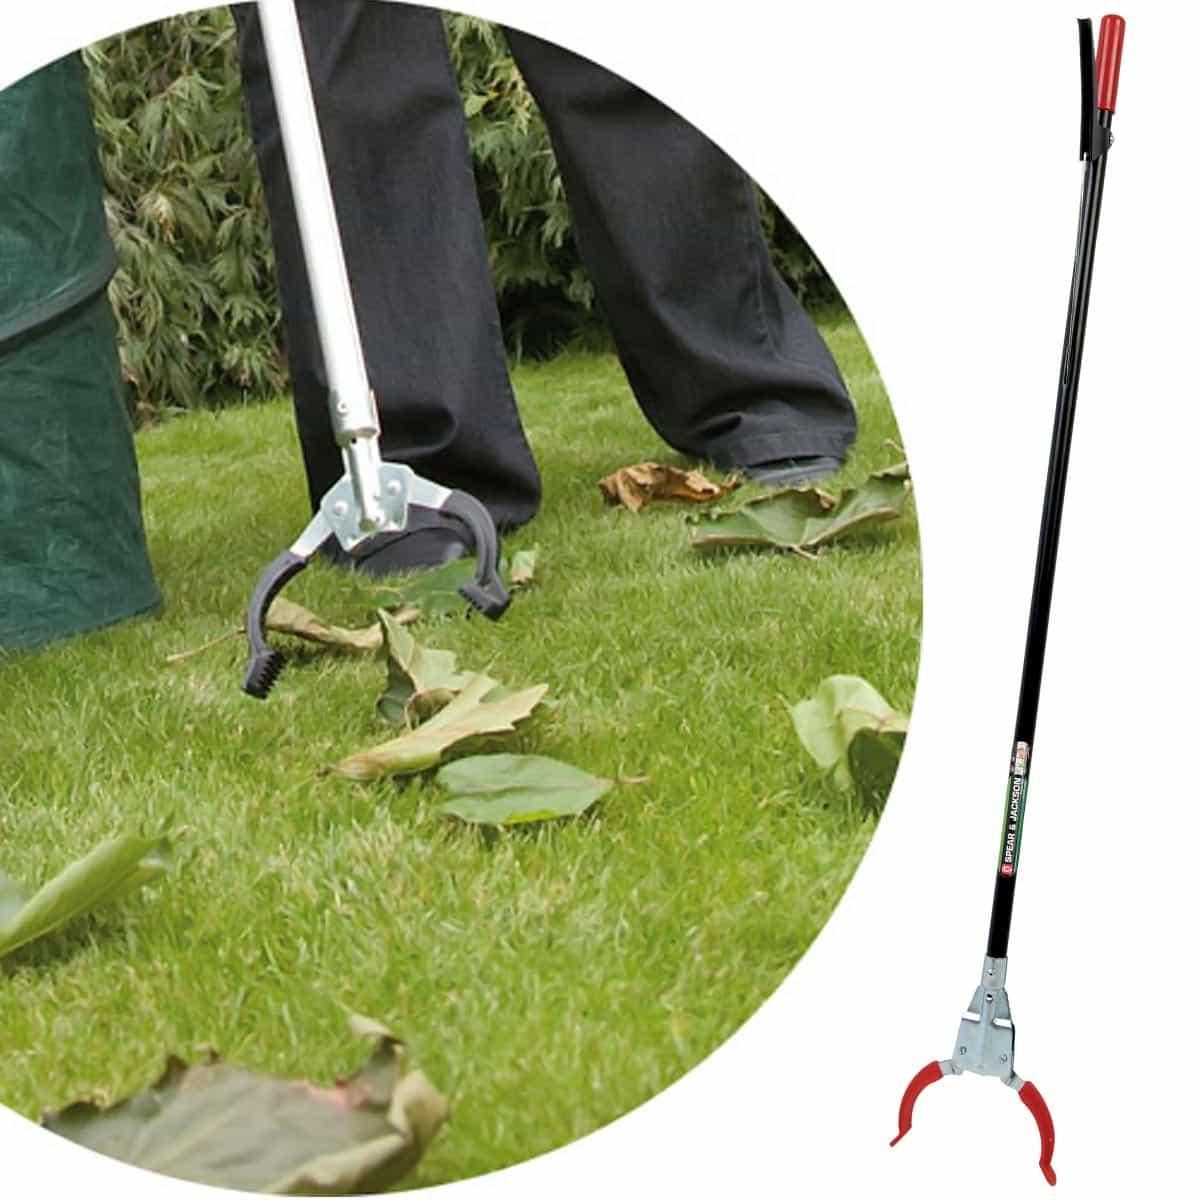 pince ramasse d chets robuste outil entretien de la pelouse. Black Bedroom Furniture Sets. Home Design Ideas